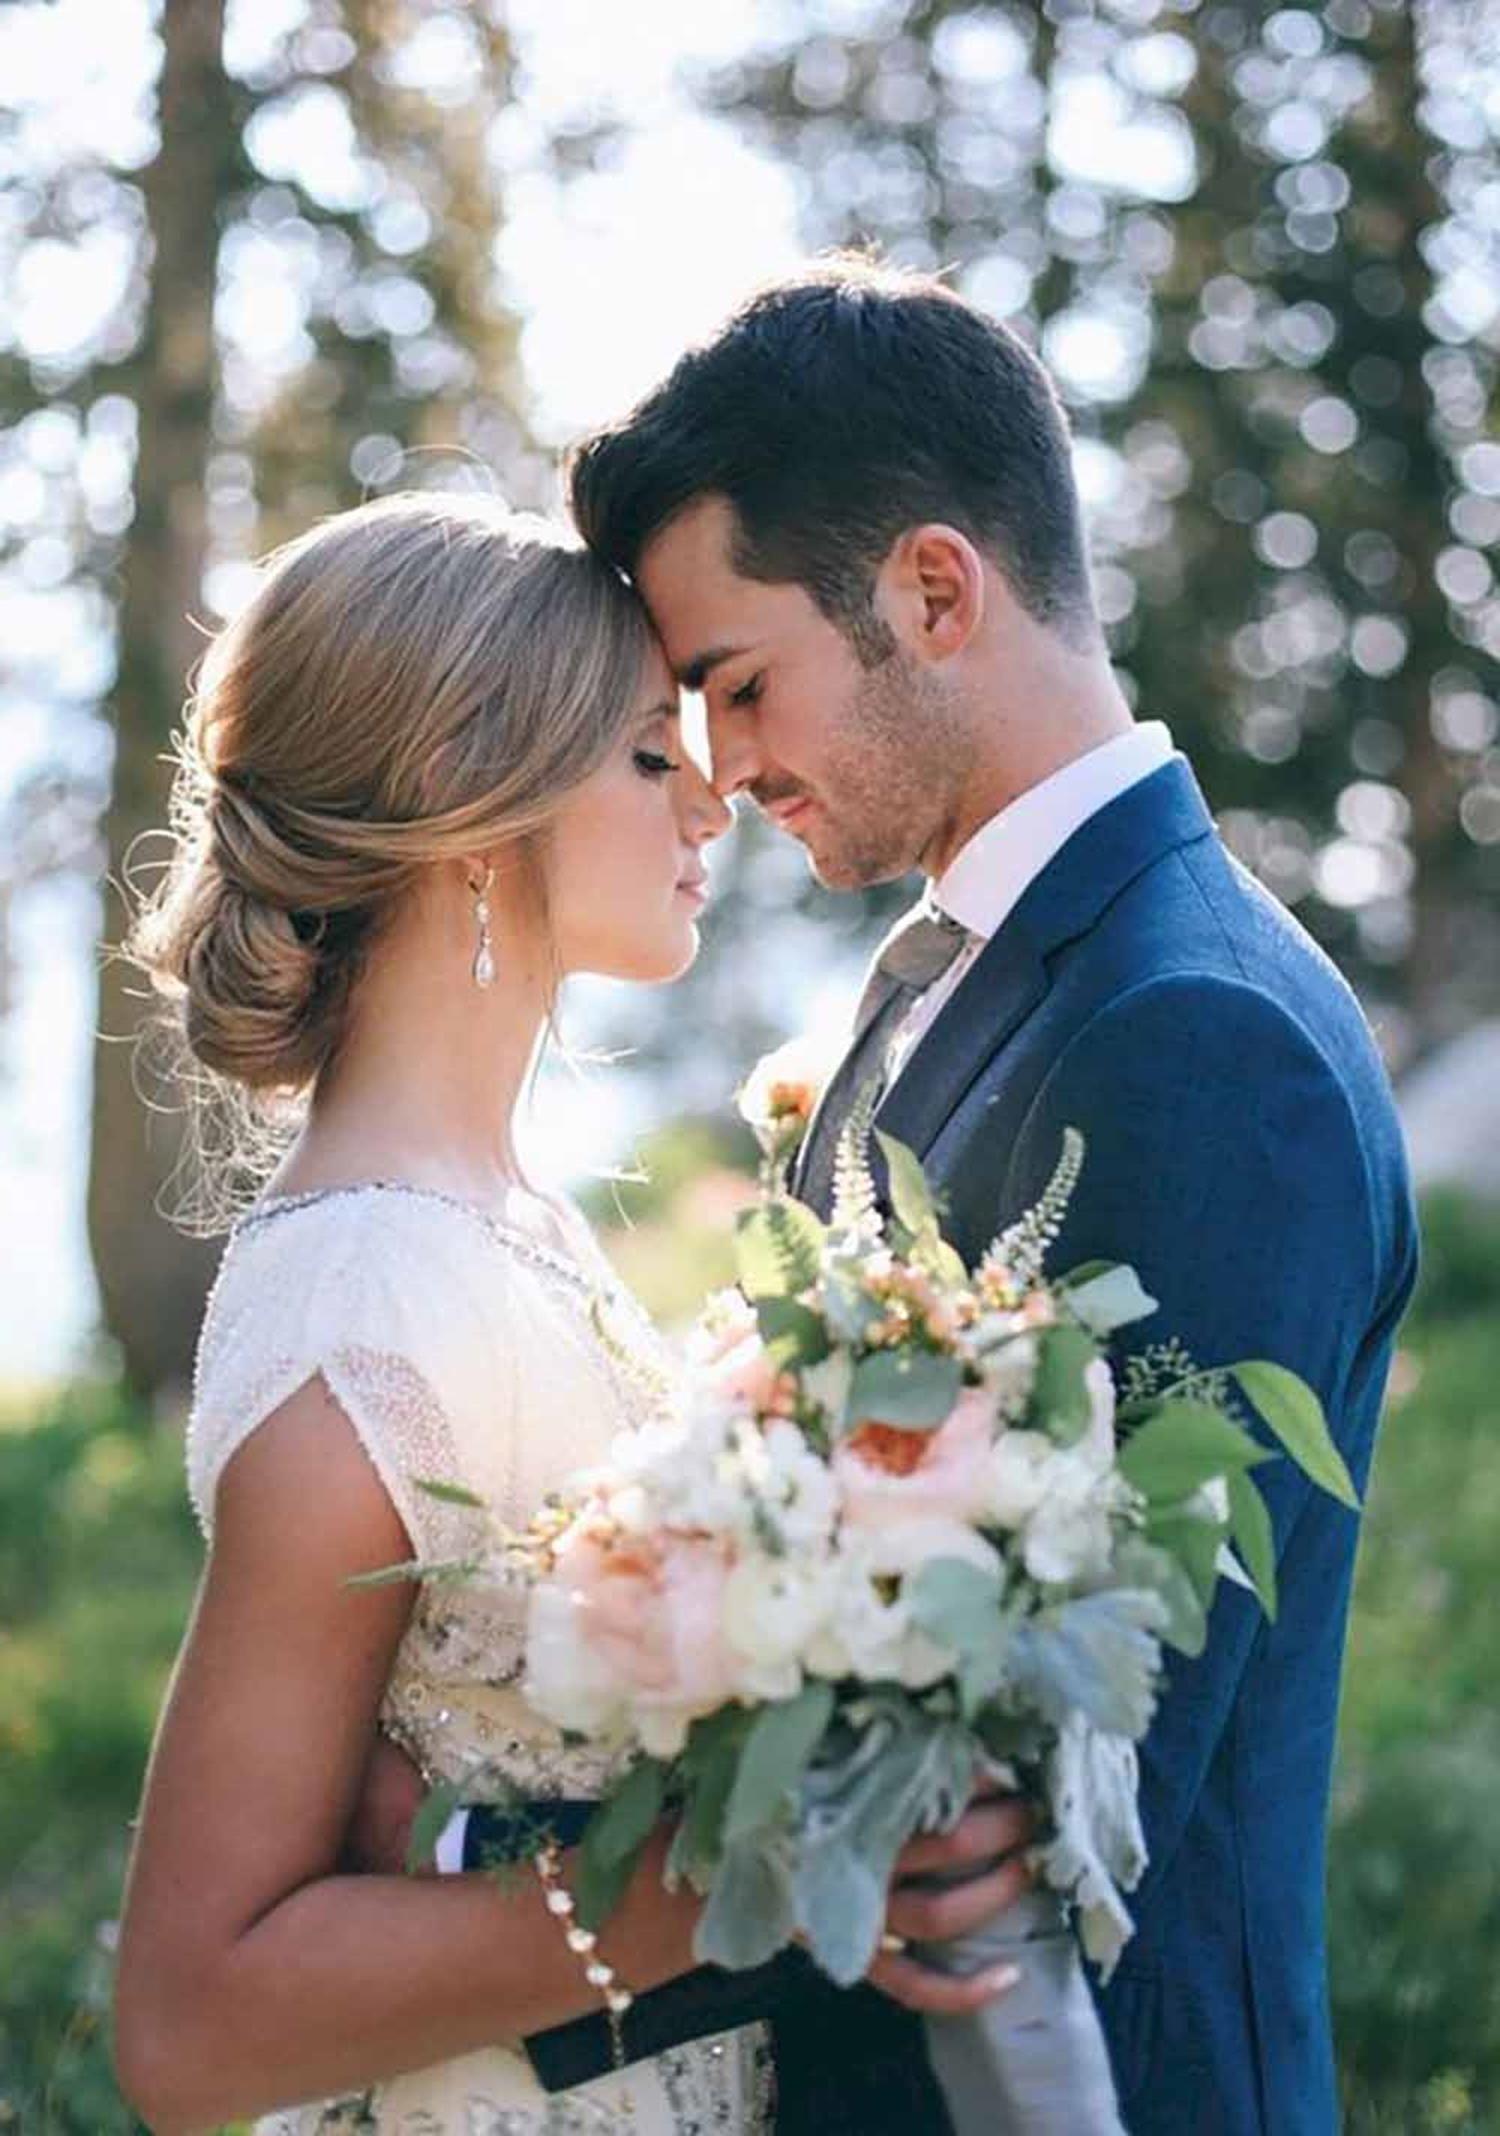 Wedding Photography Reddit In 2020 Wedding Photos Poses Romantic Wedding Photos Romantic Wedding Photos Poses